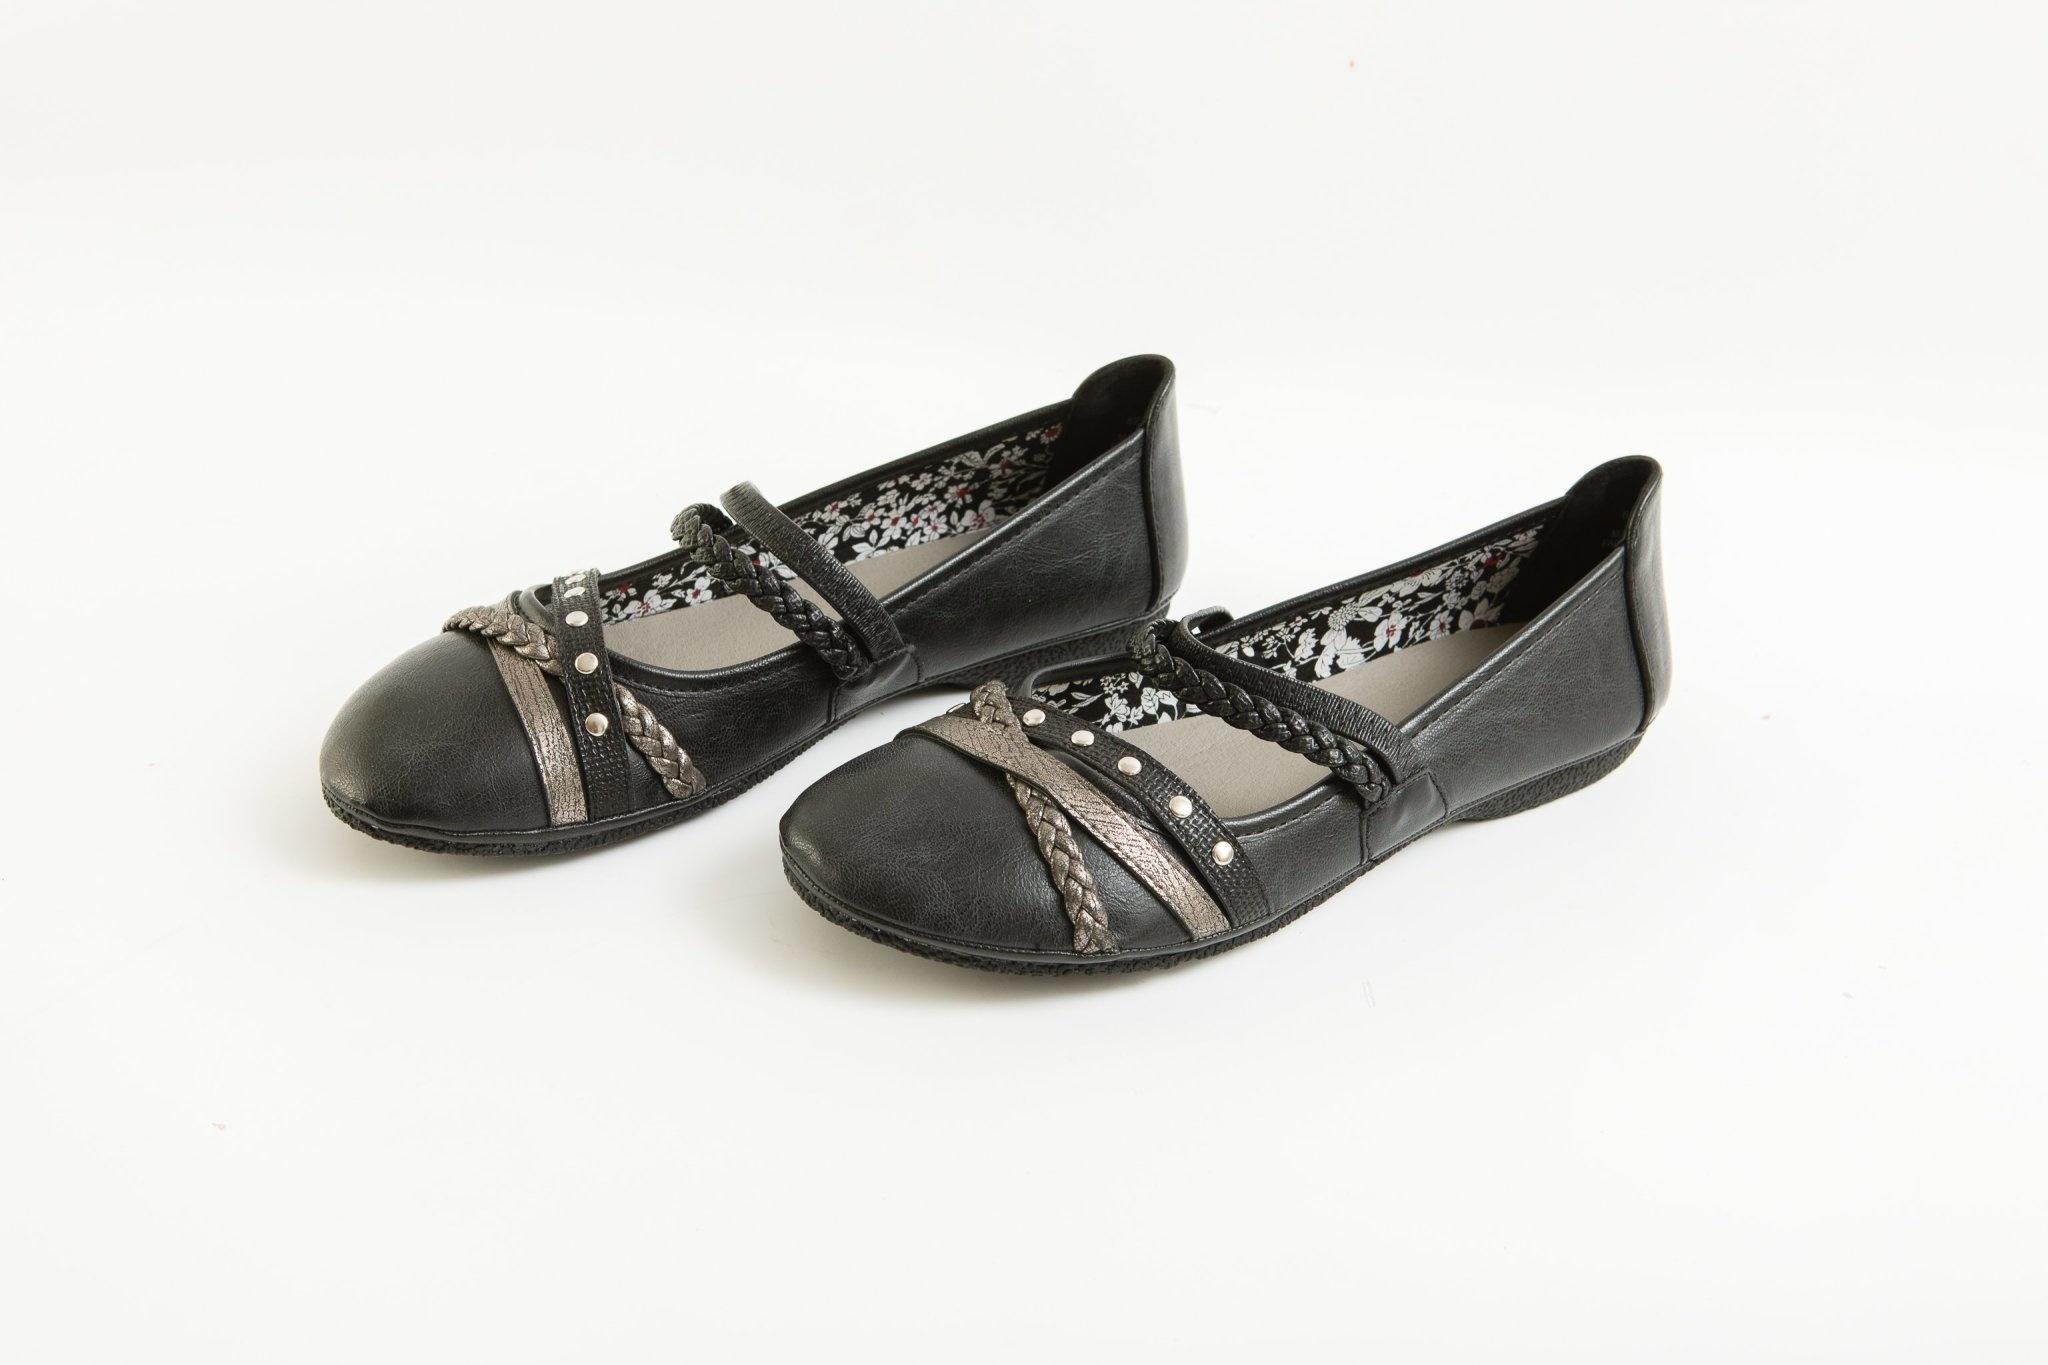 Black Flat with Embellishments